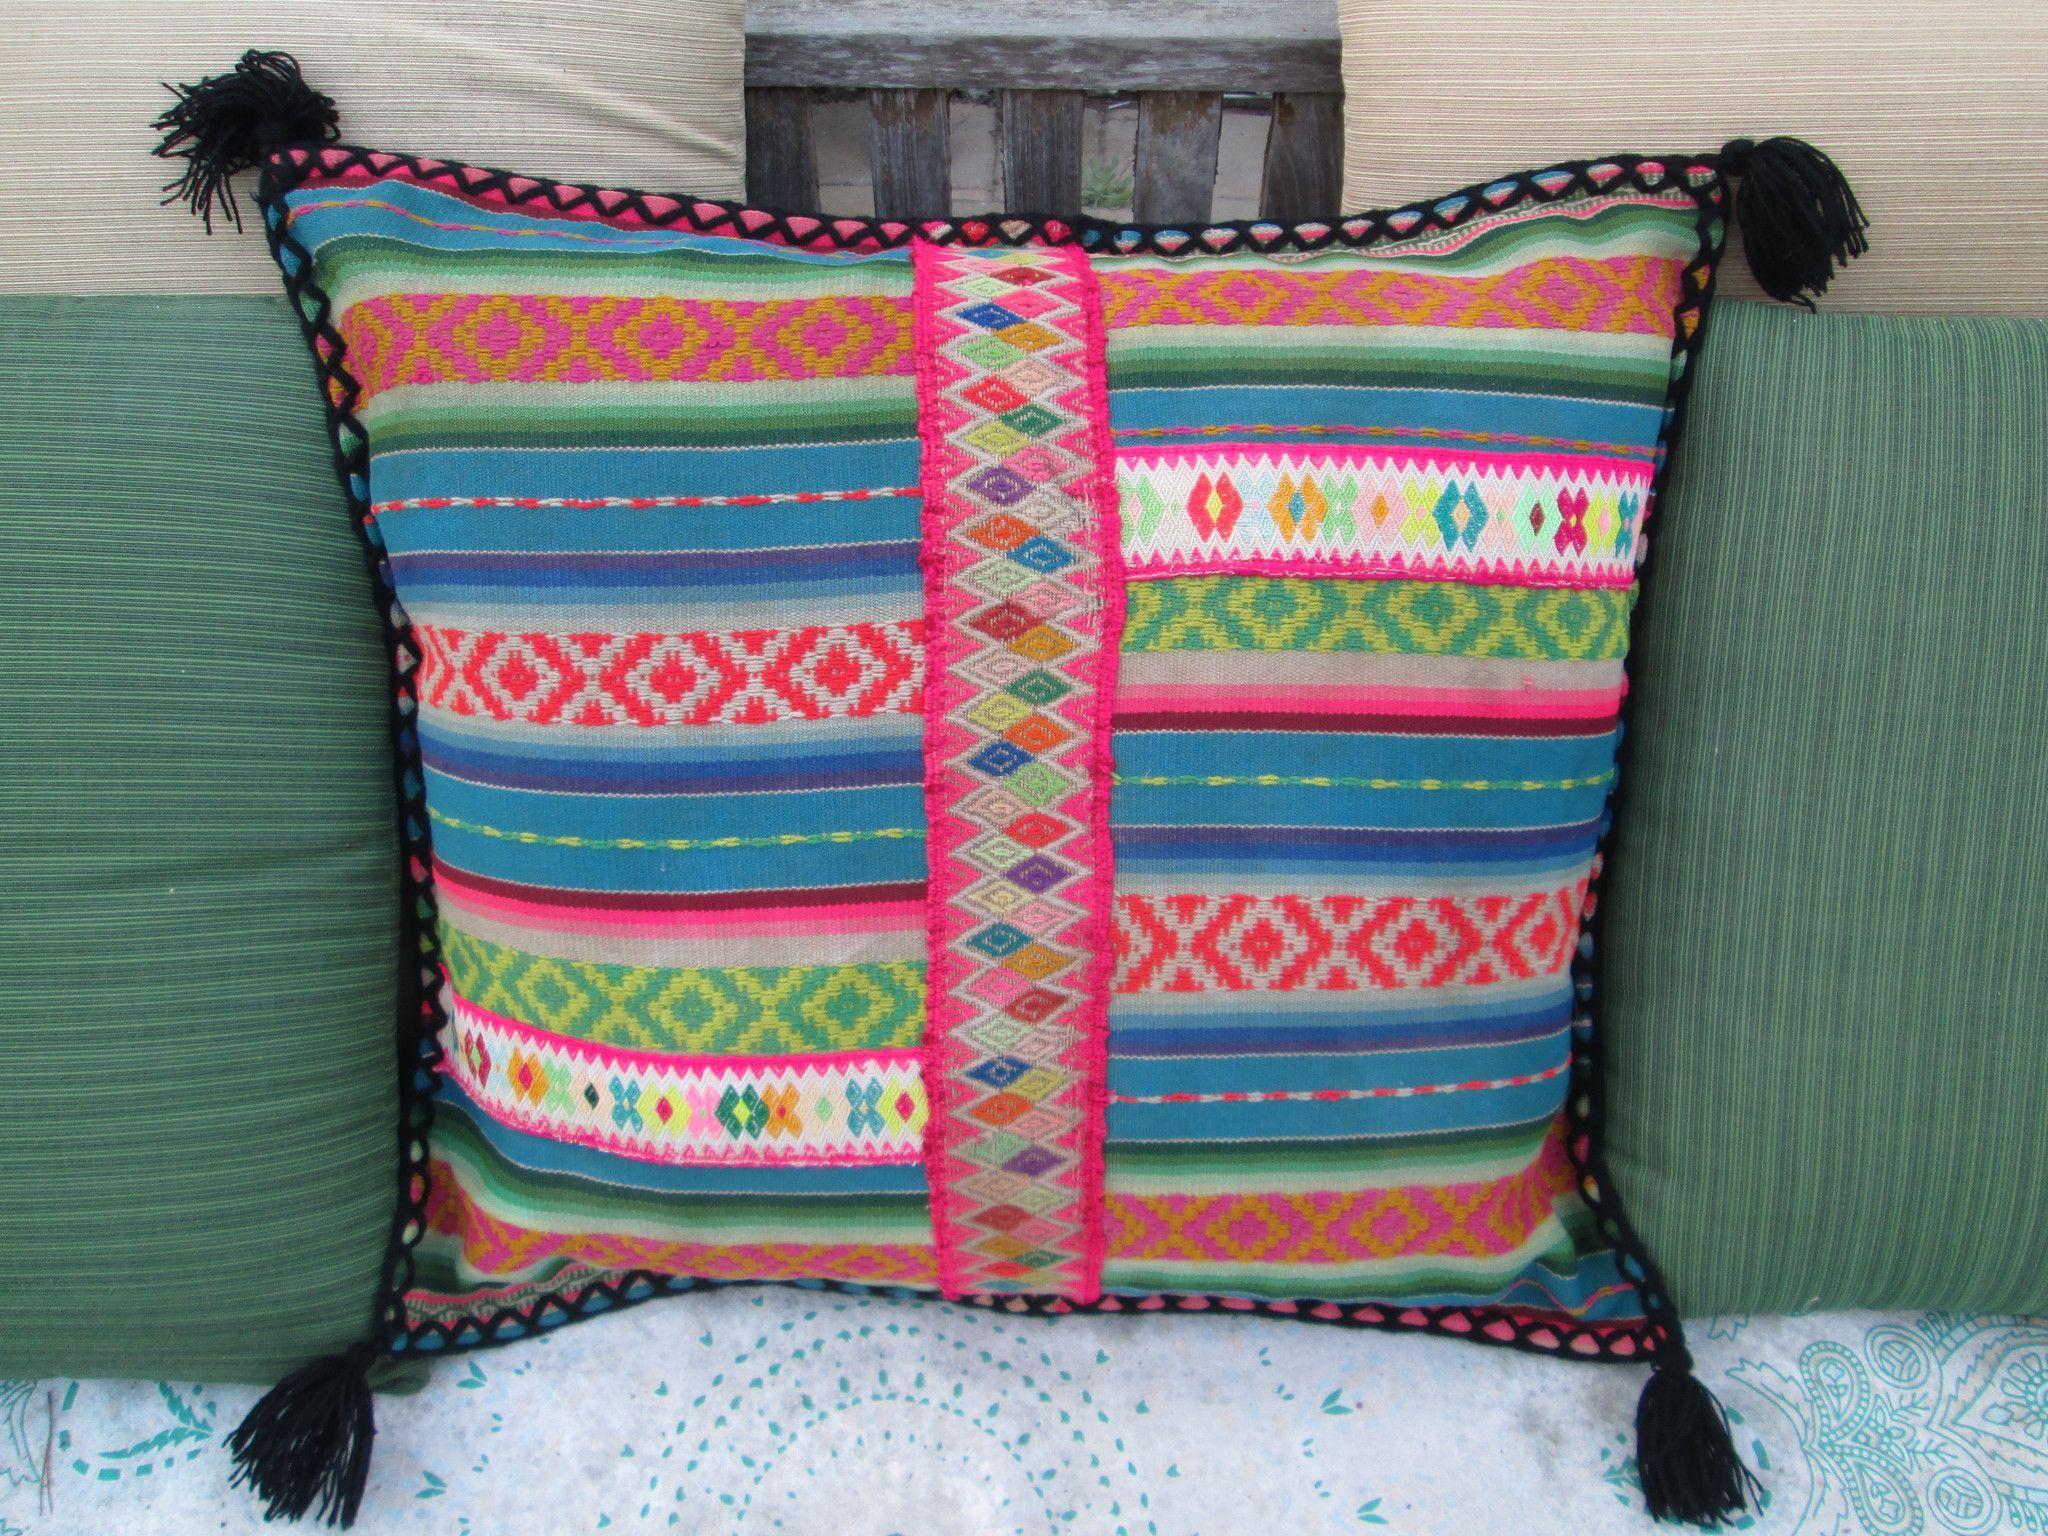 Peruvian Pillow in Oscuro